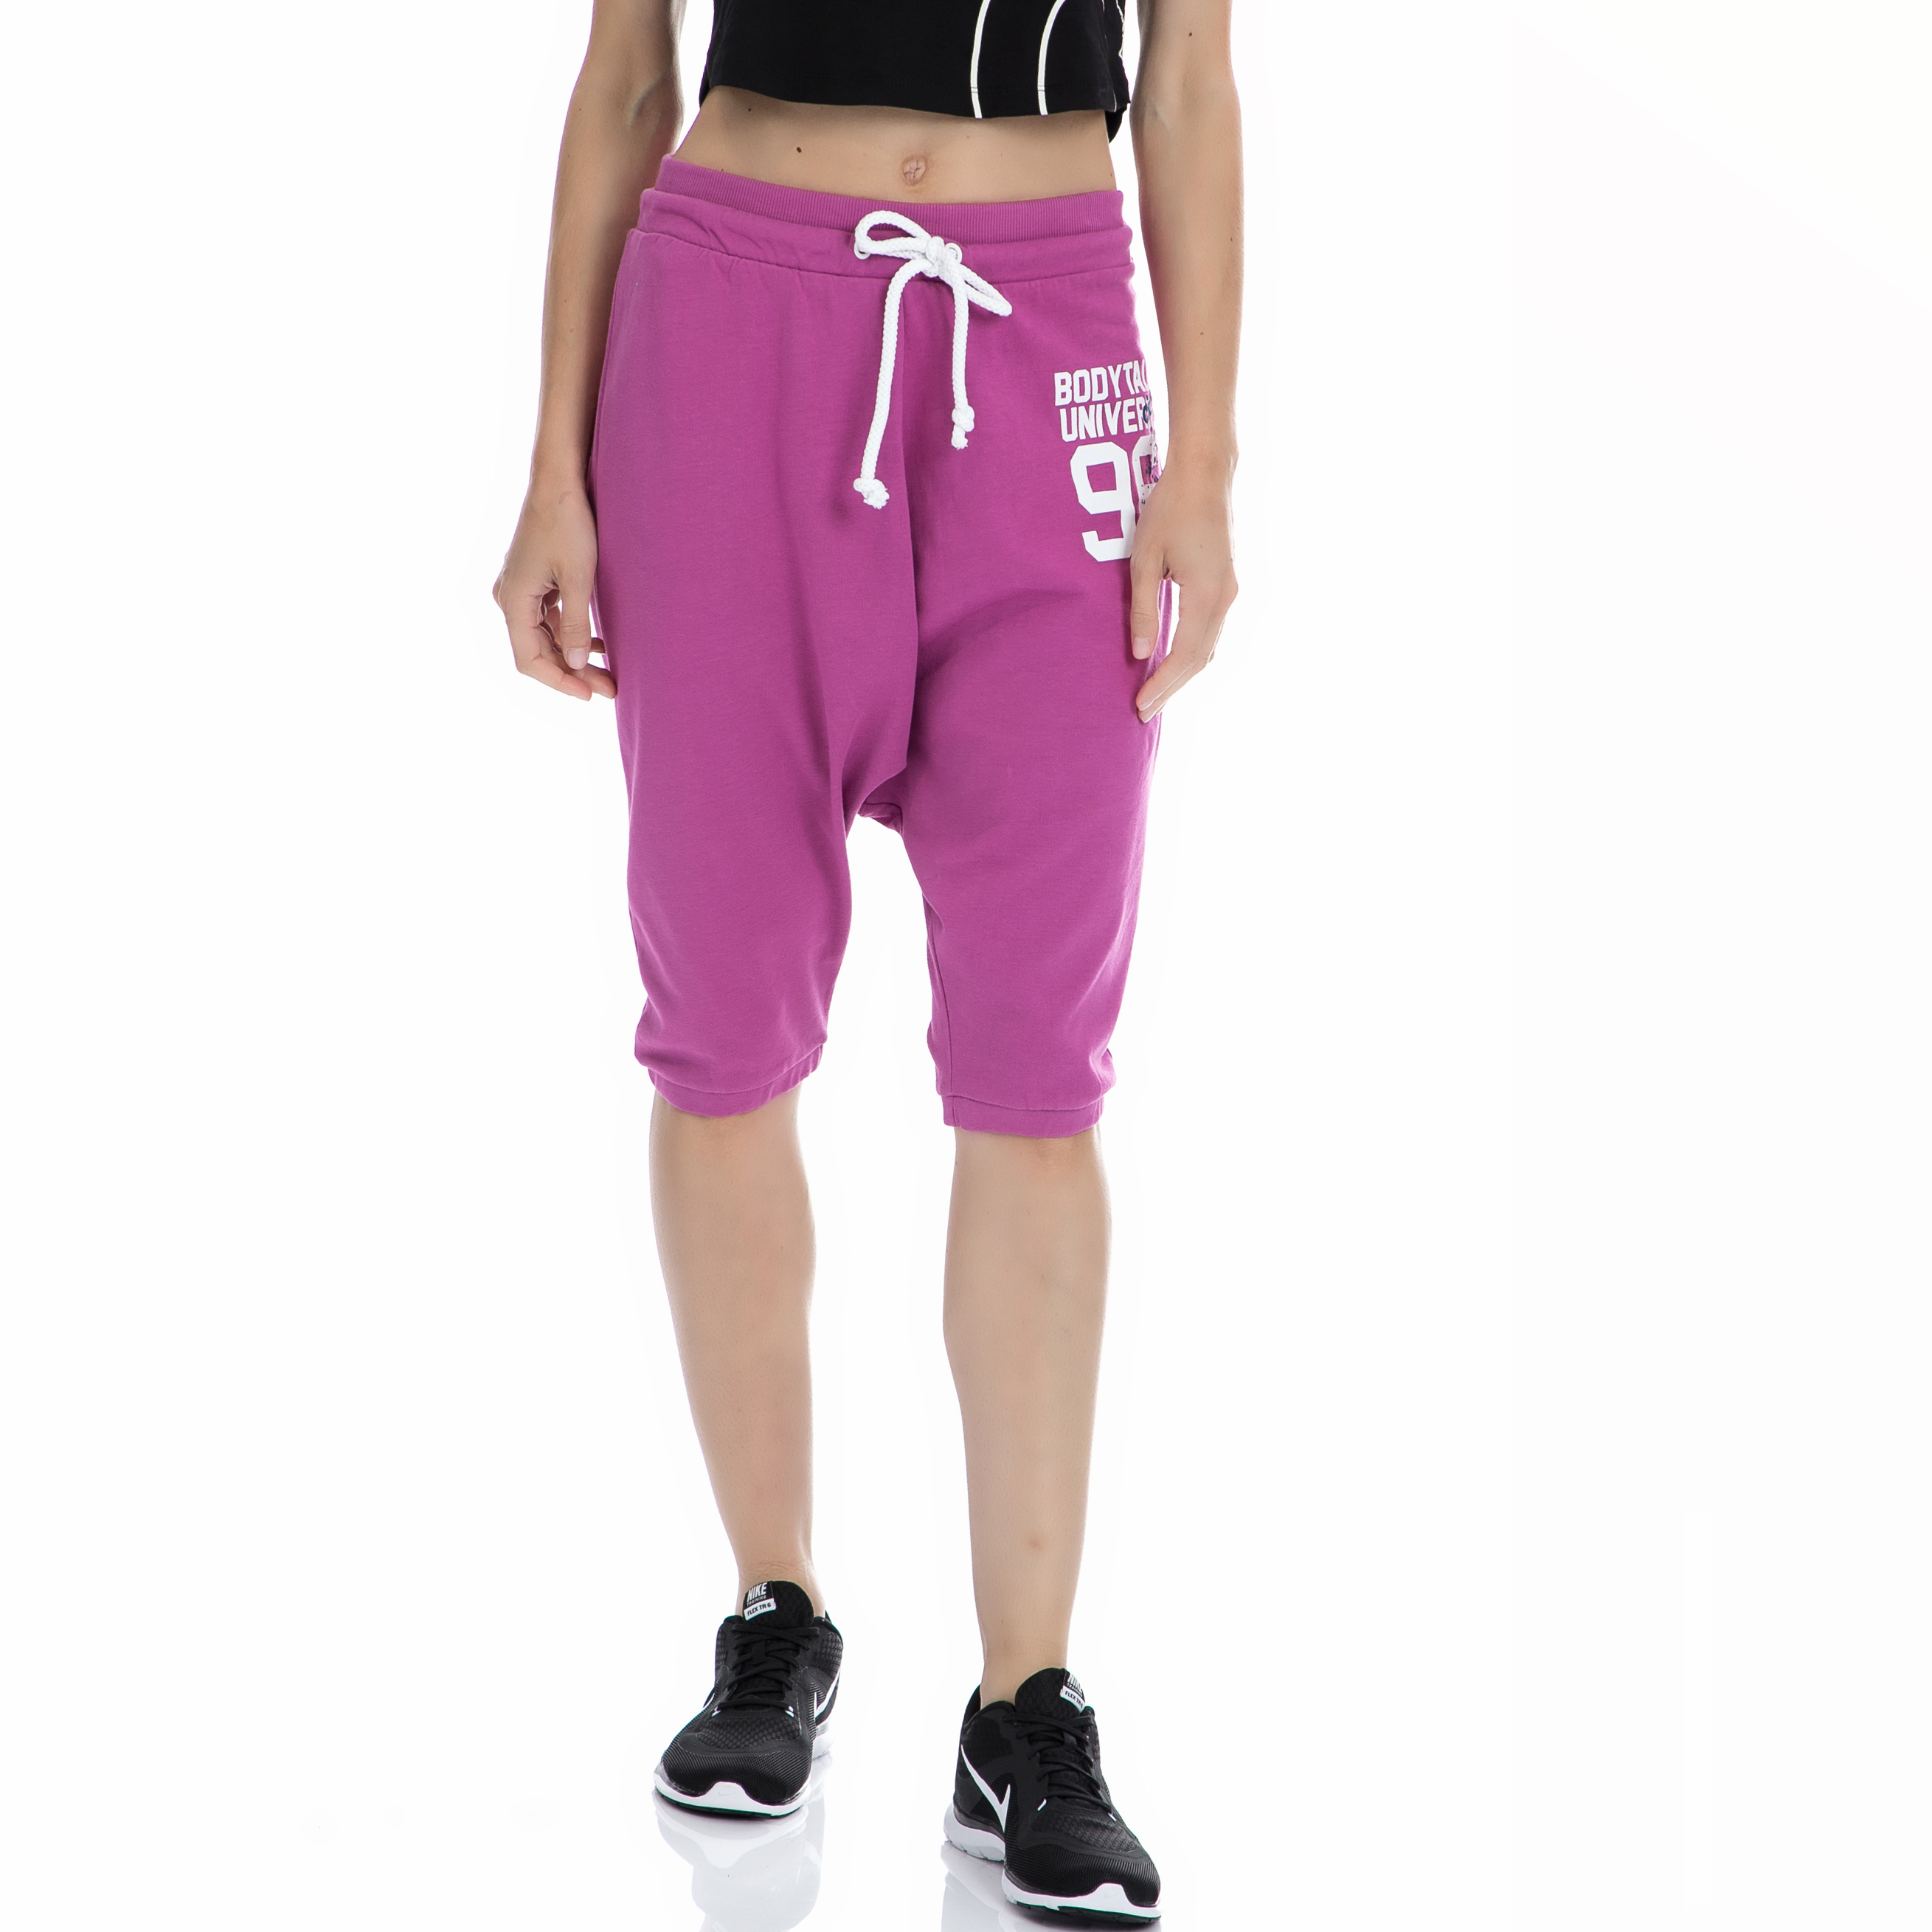 BODYTALK - Γυναικεία φόρμα BODYTALK μωβ-ροζ γυναικεία ρούχα αθλητικά φόρμες